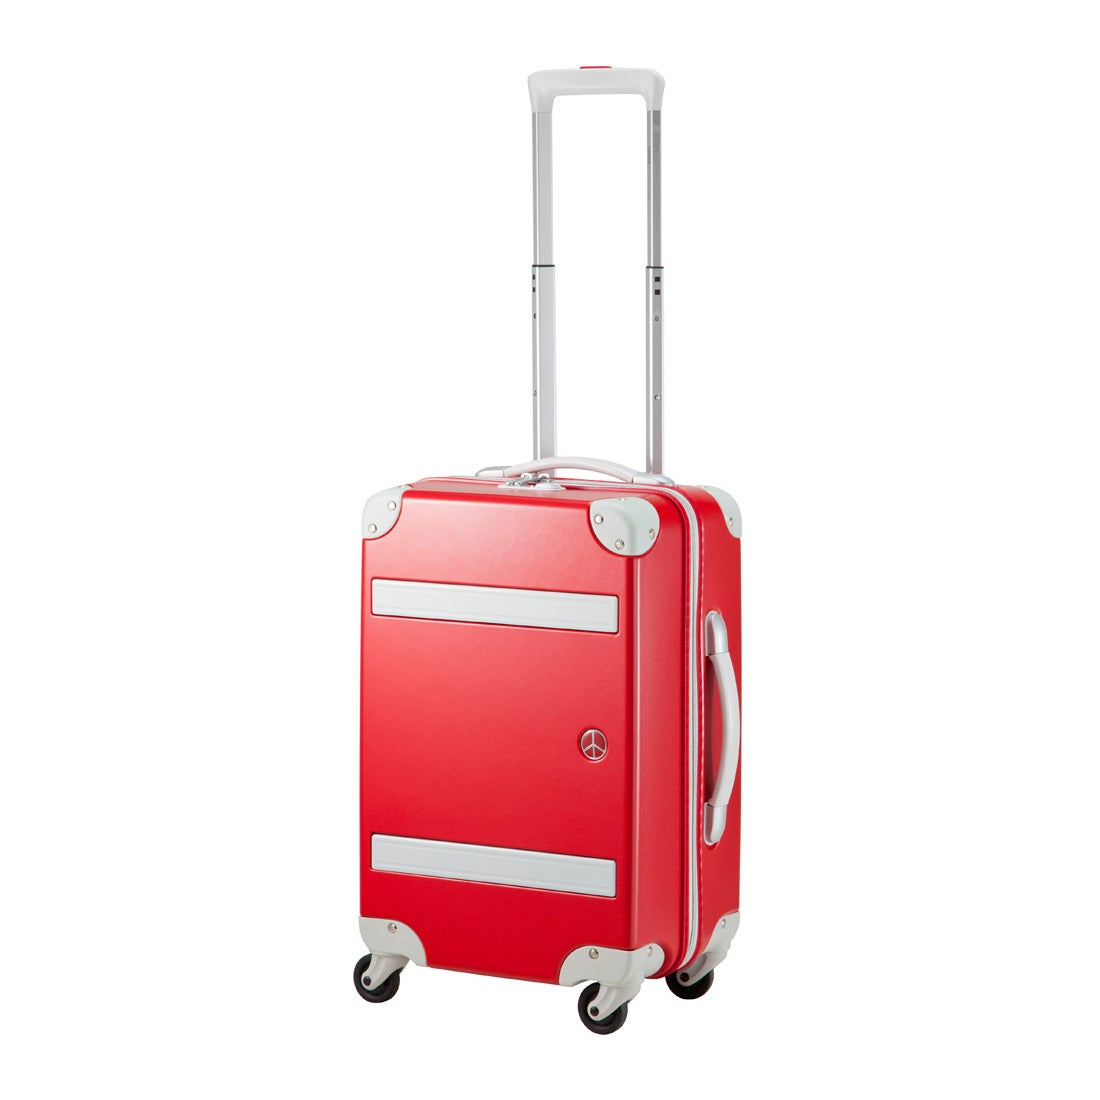 【SAC'S BAR】プラスワン スーツケース PEACE×Passenger 8170-49 49cm アップルレッド メンズ